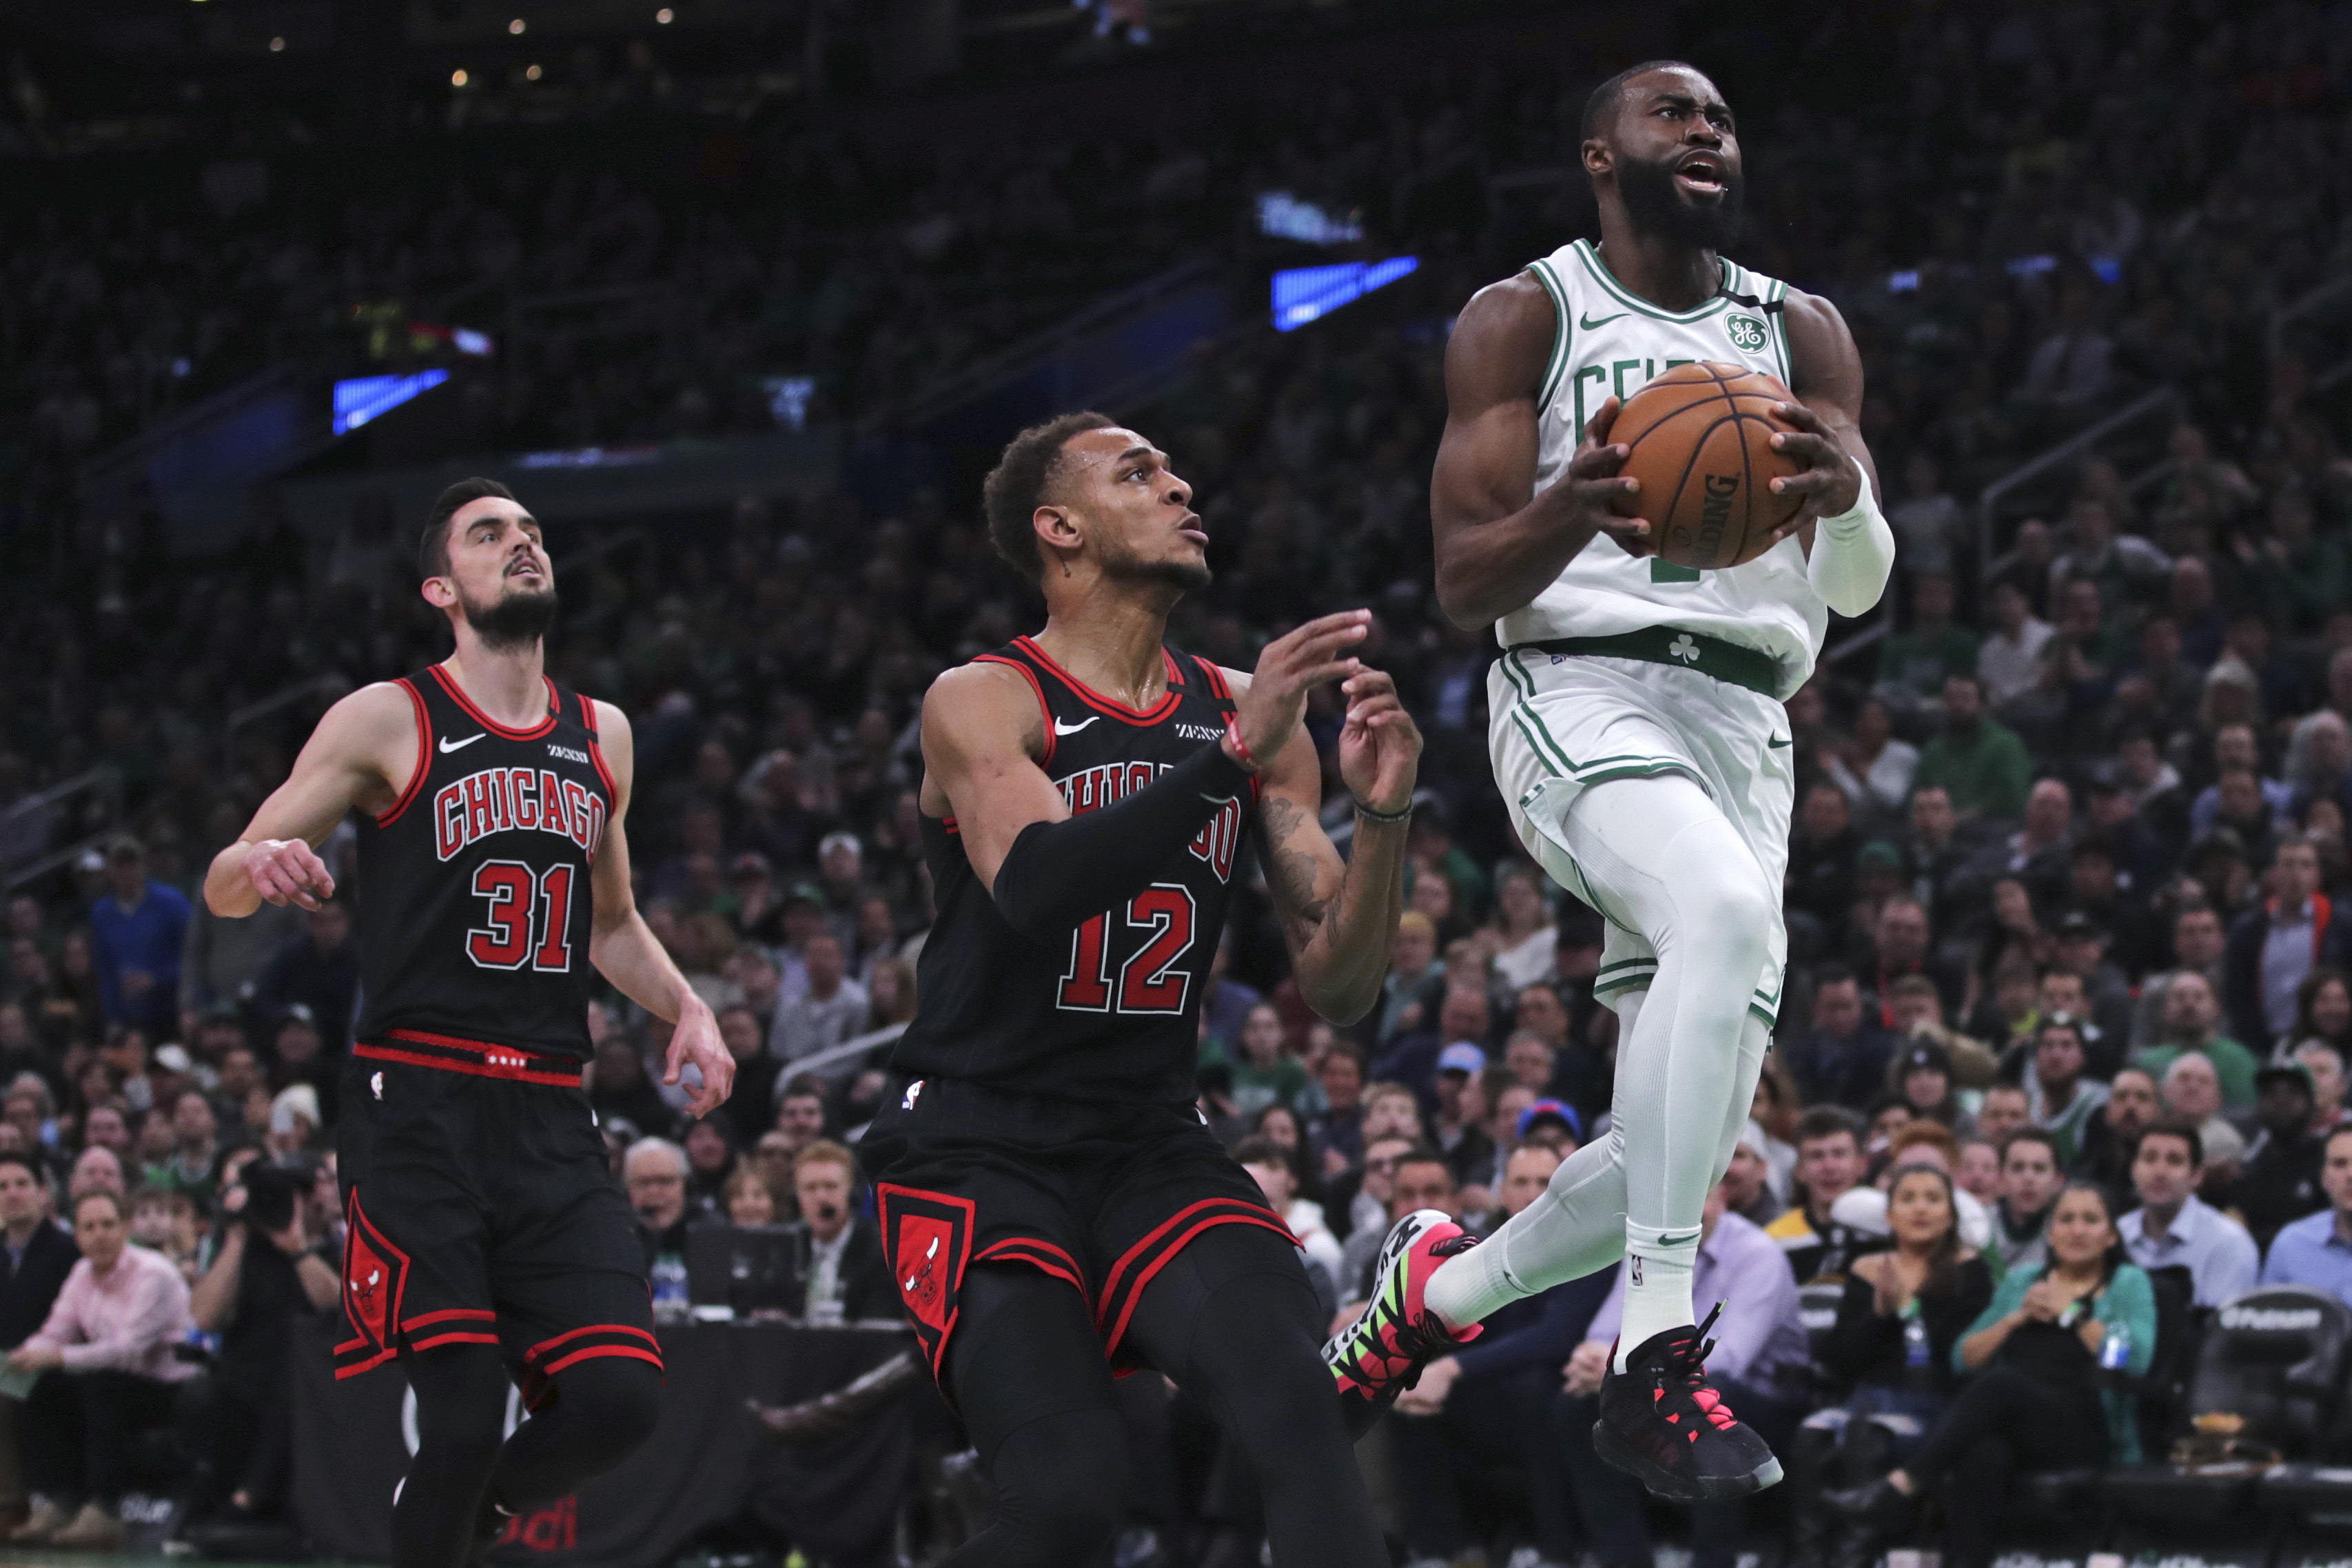 Tatum and Brown lead Celtics to 113-101 win over Bulls